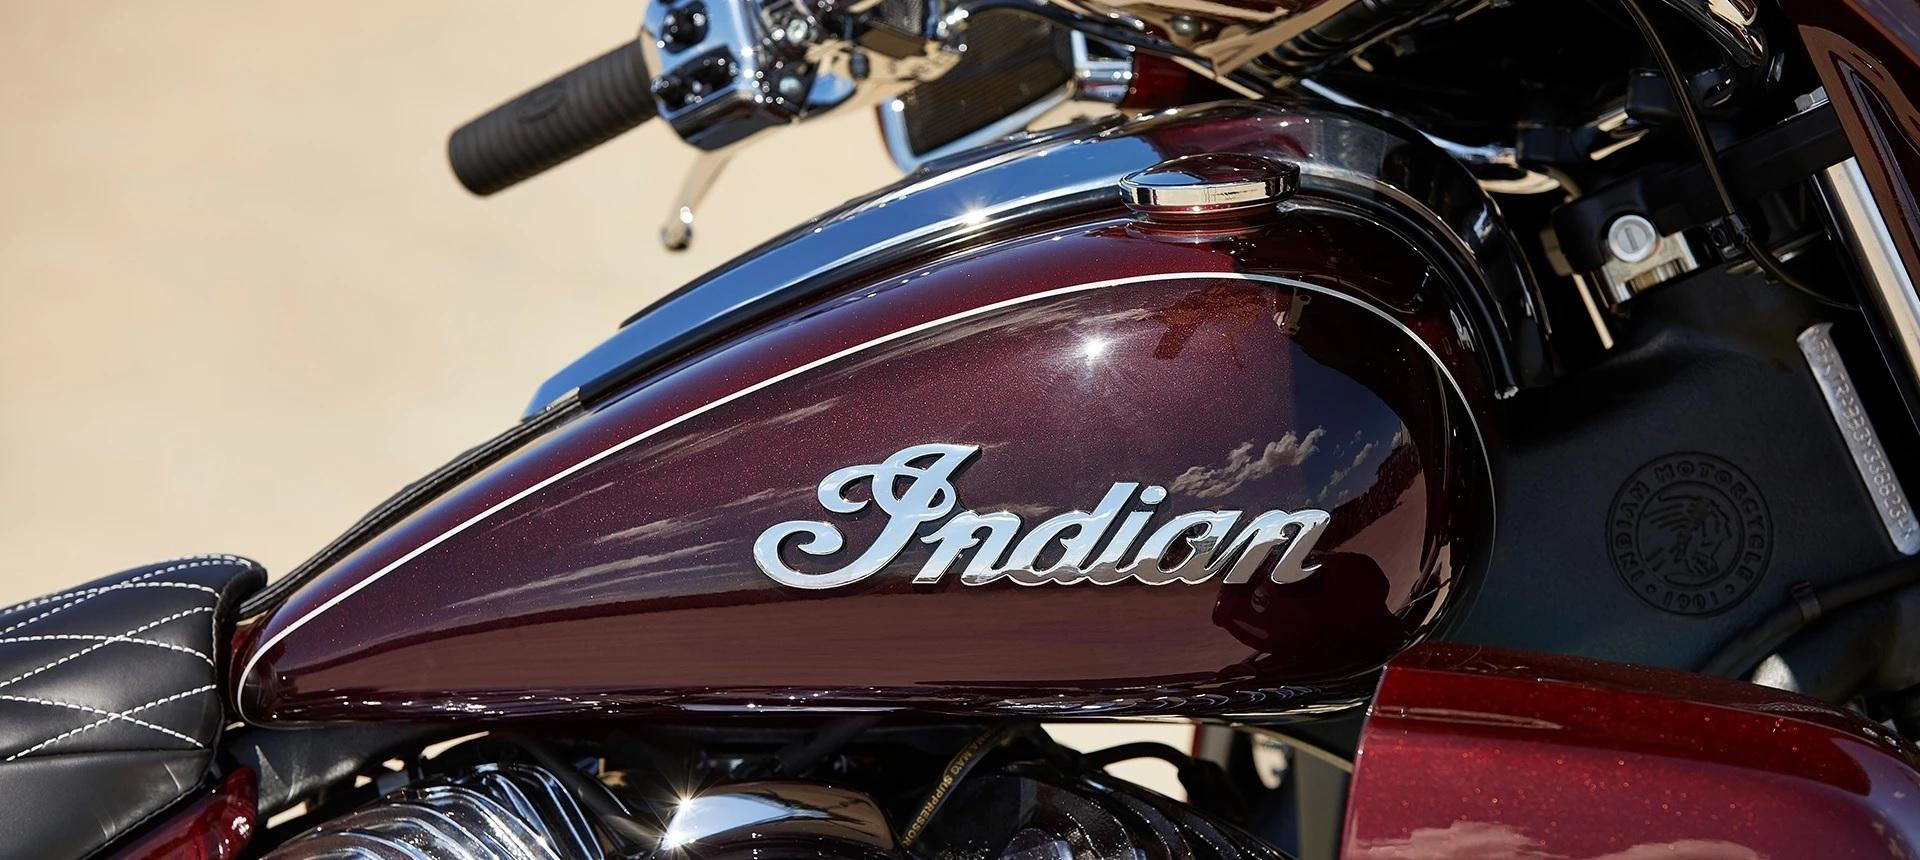 2021 Indian Roadmaster